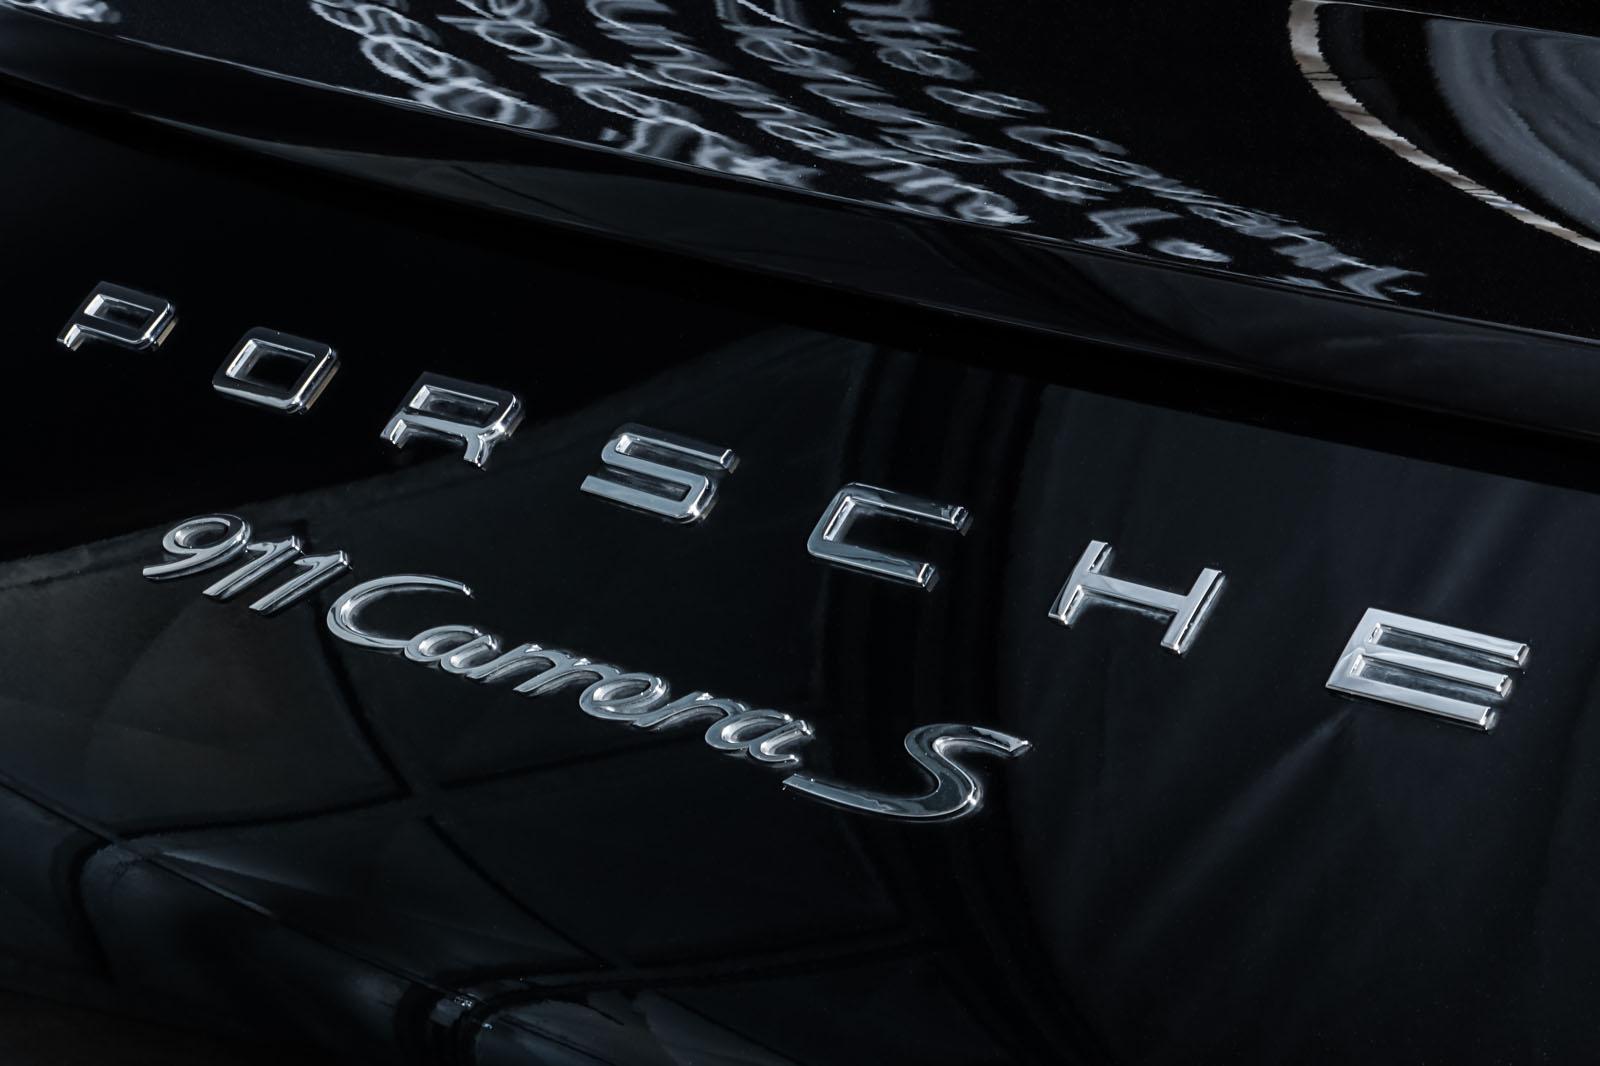 Porsche_991_CarreraS_Cabrio_Schwarz_Schwarz_POR-7555_18_w